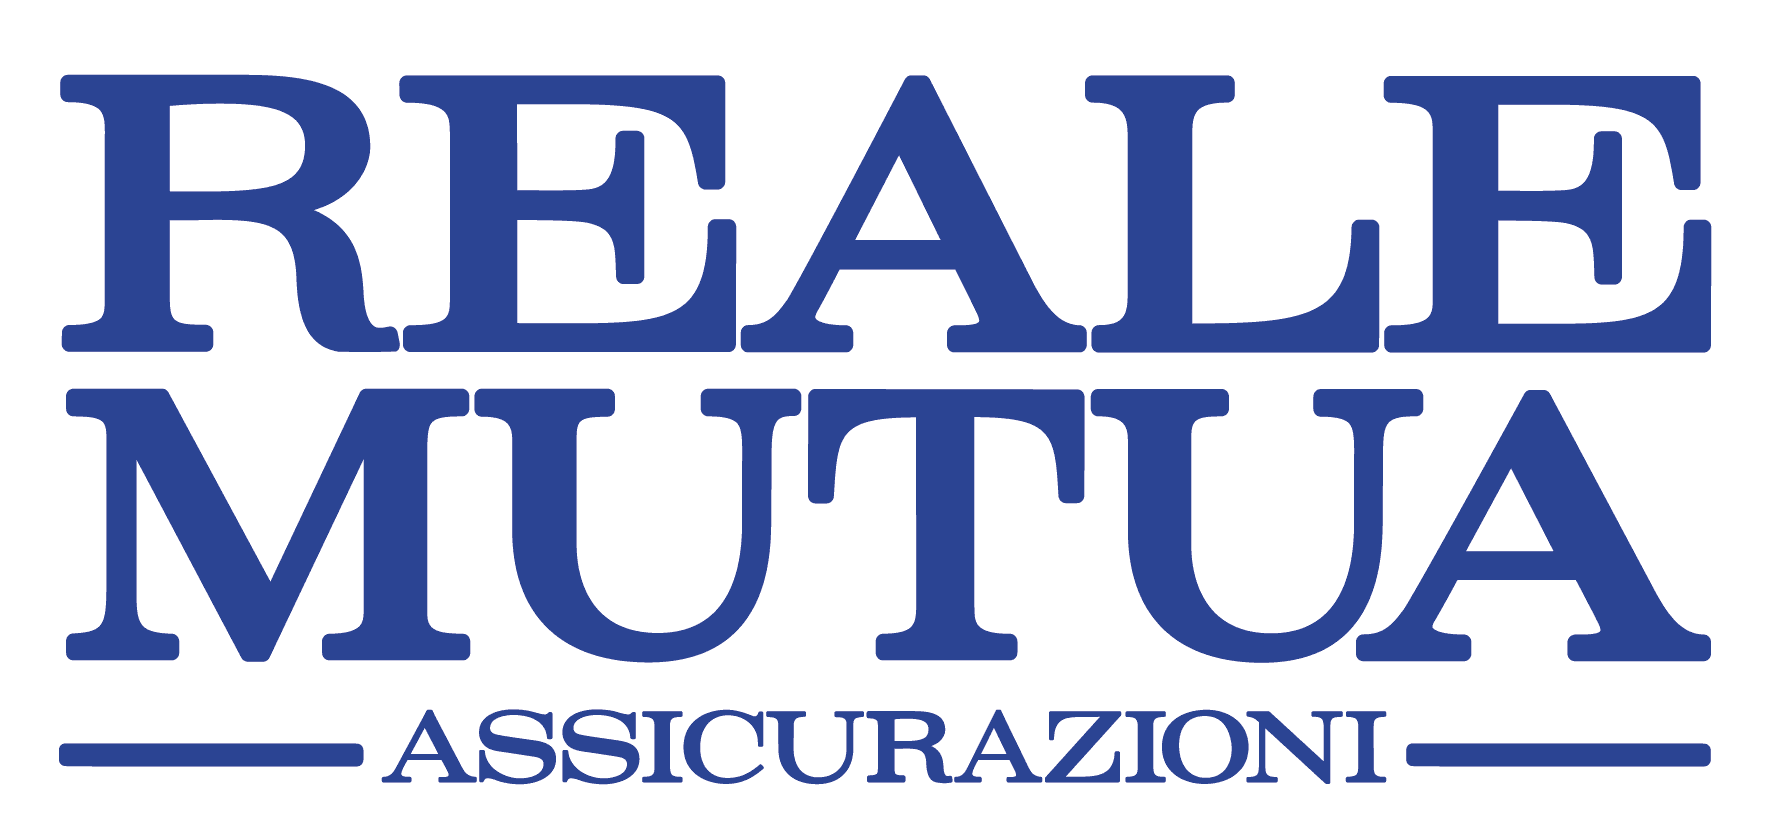 Reale Mutua Assicurazioni – logo